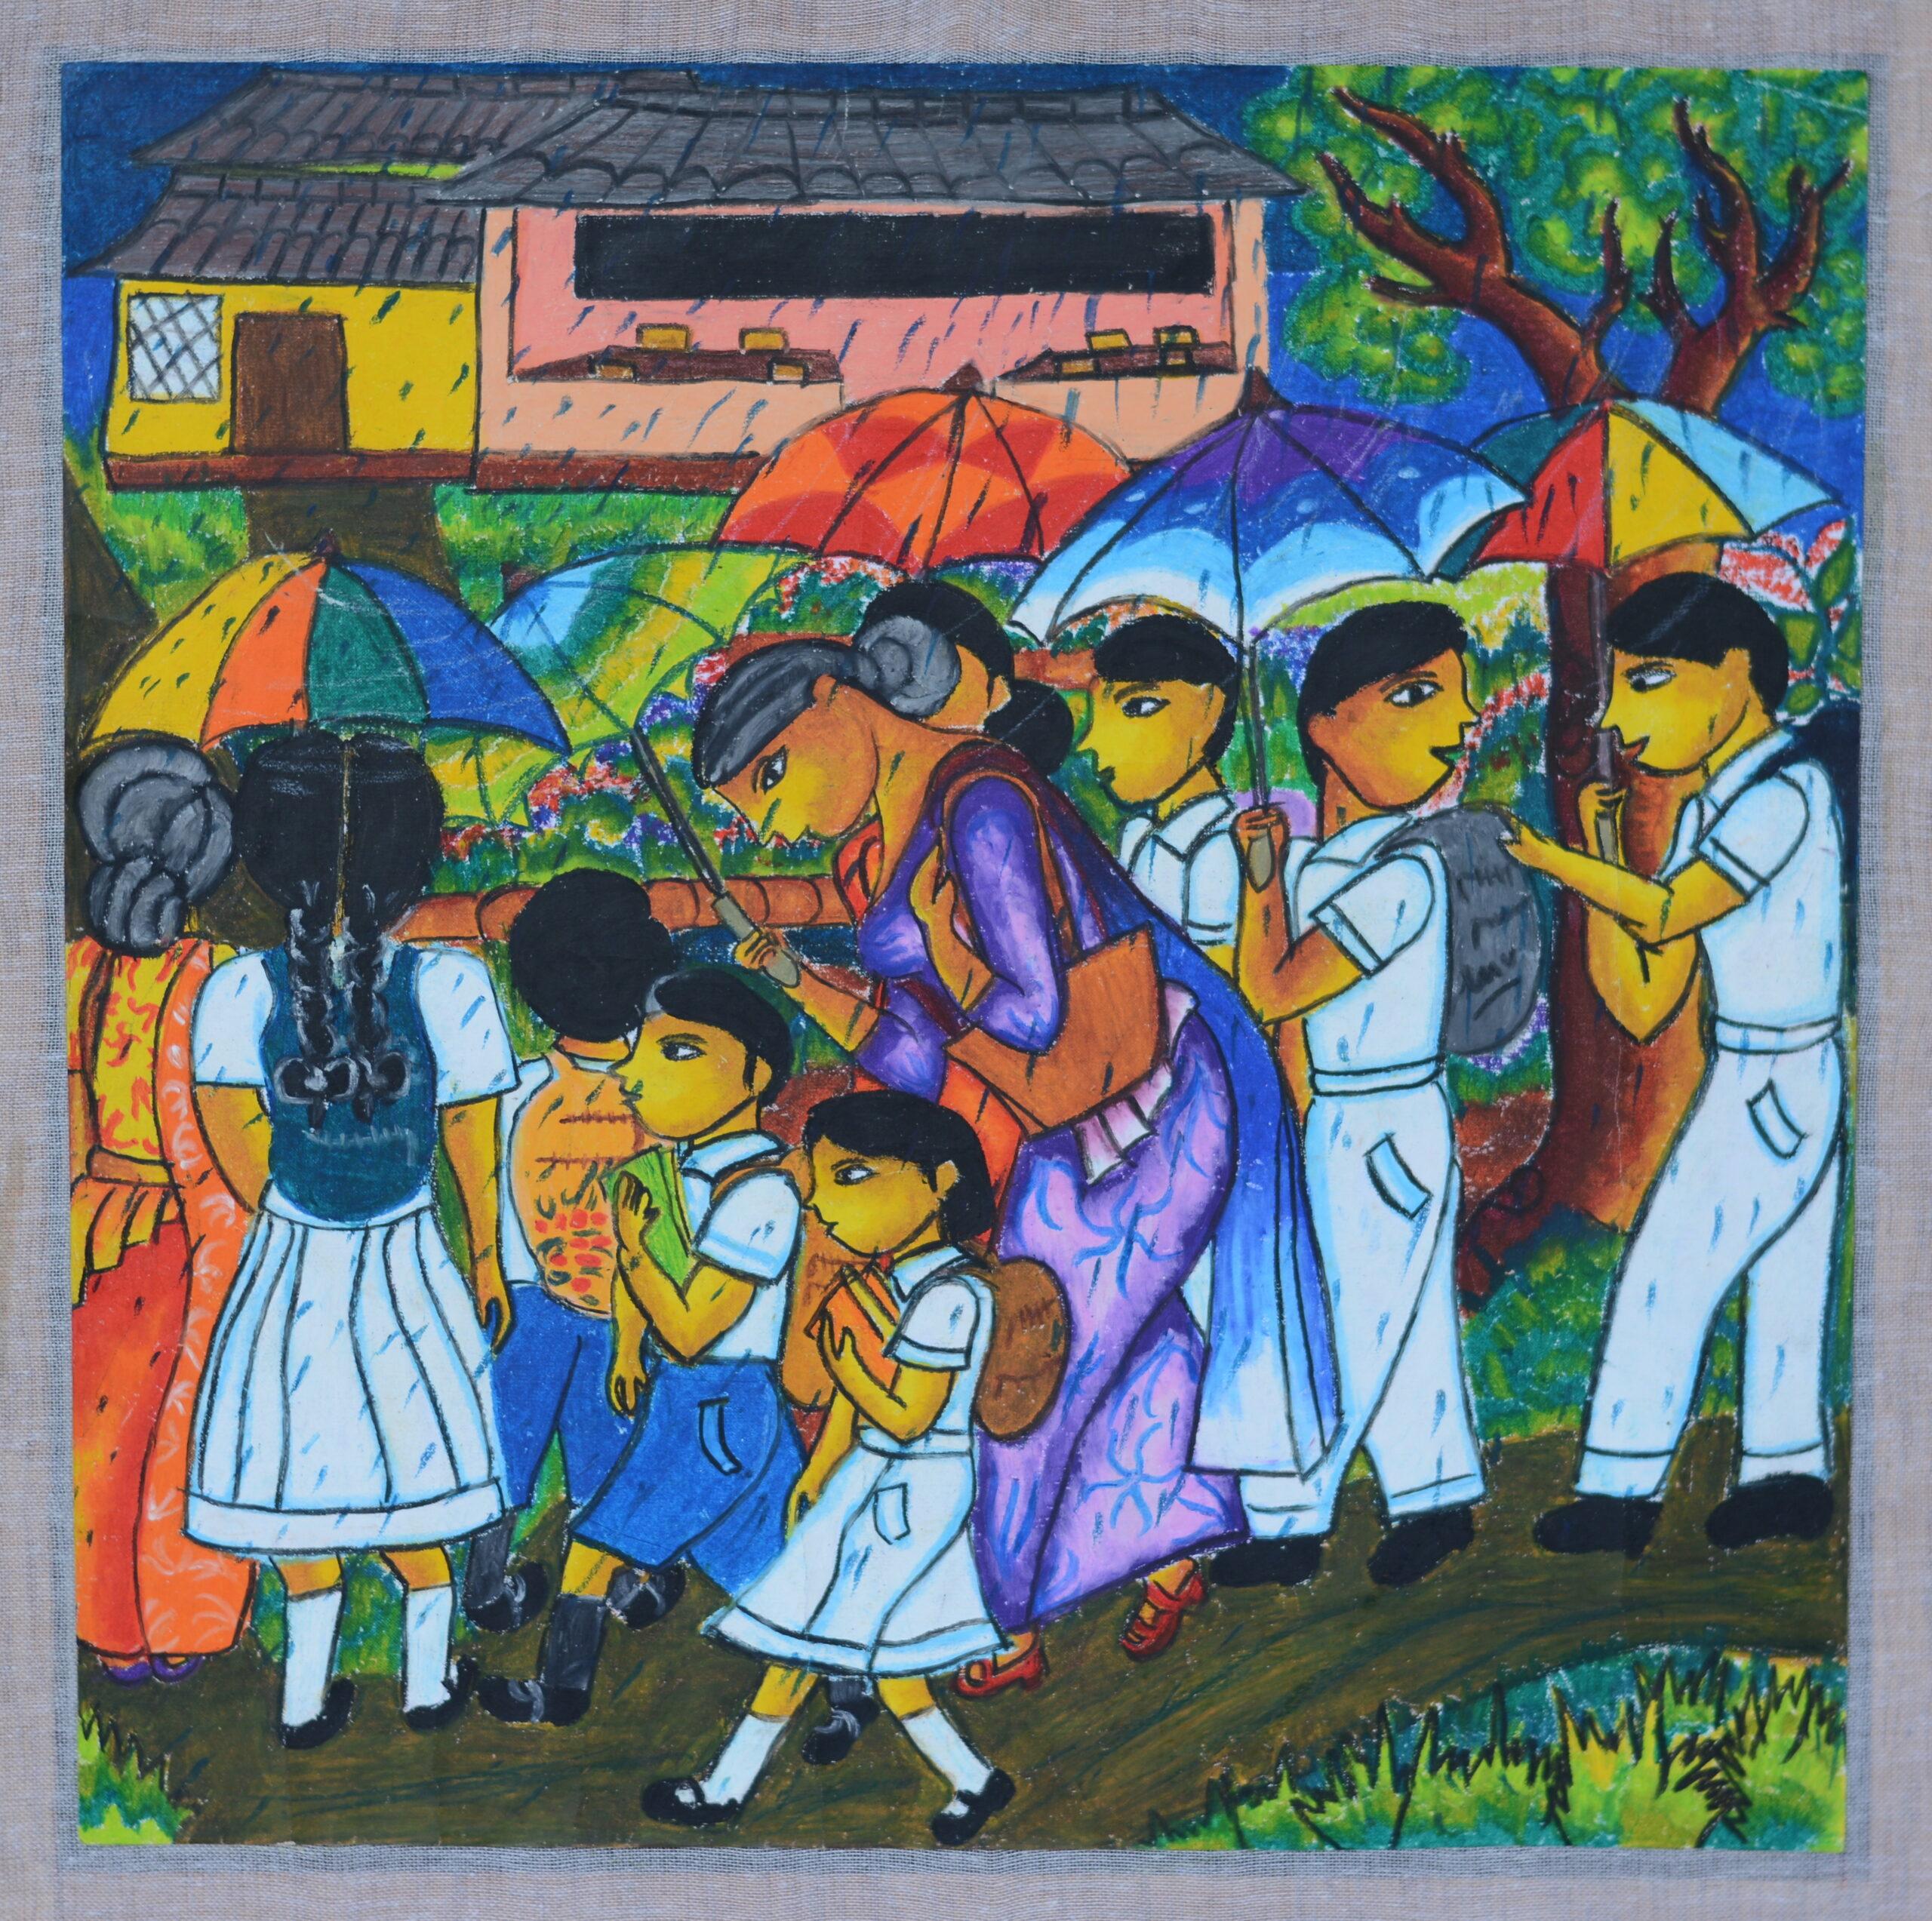 A group of children goes to the school on a rainy day_Nipuni Dinethma Piyathissa